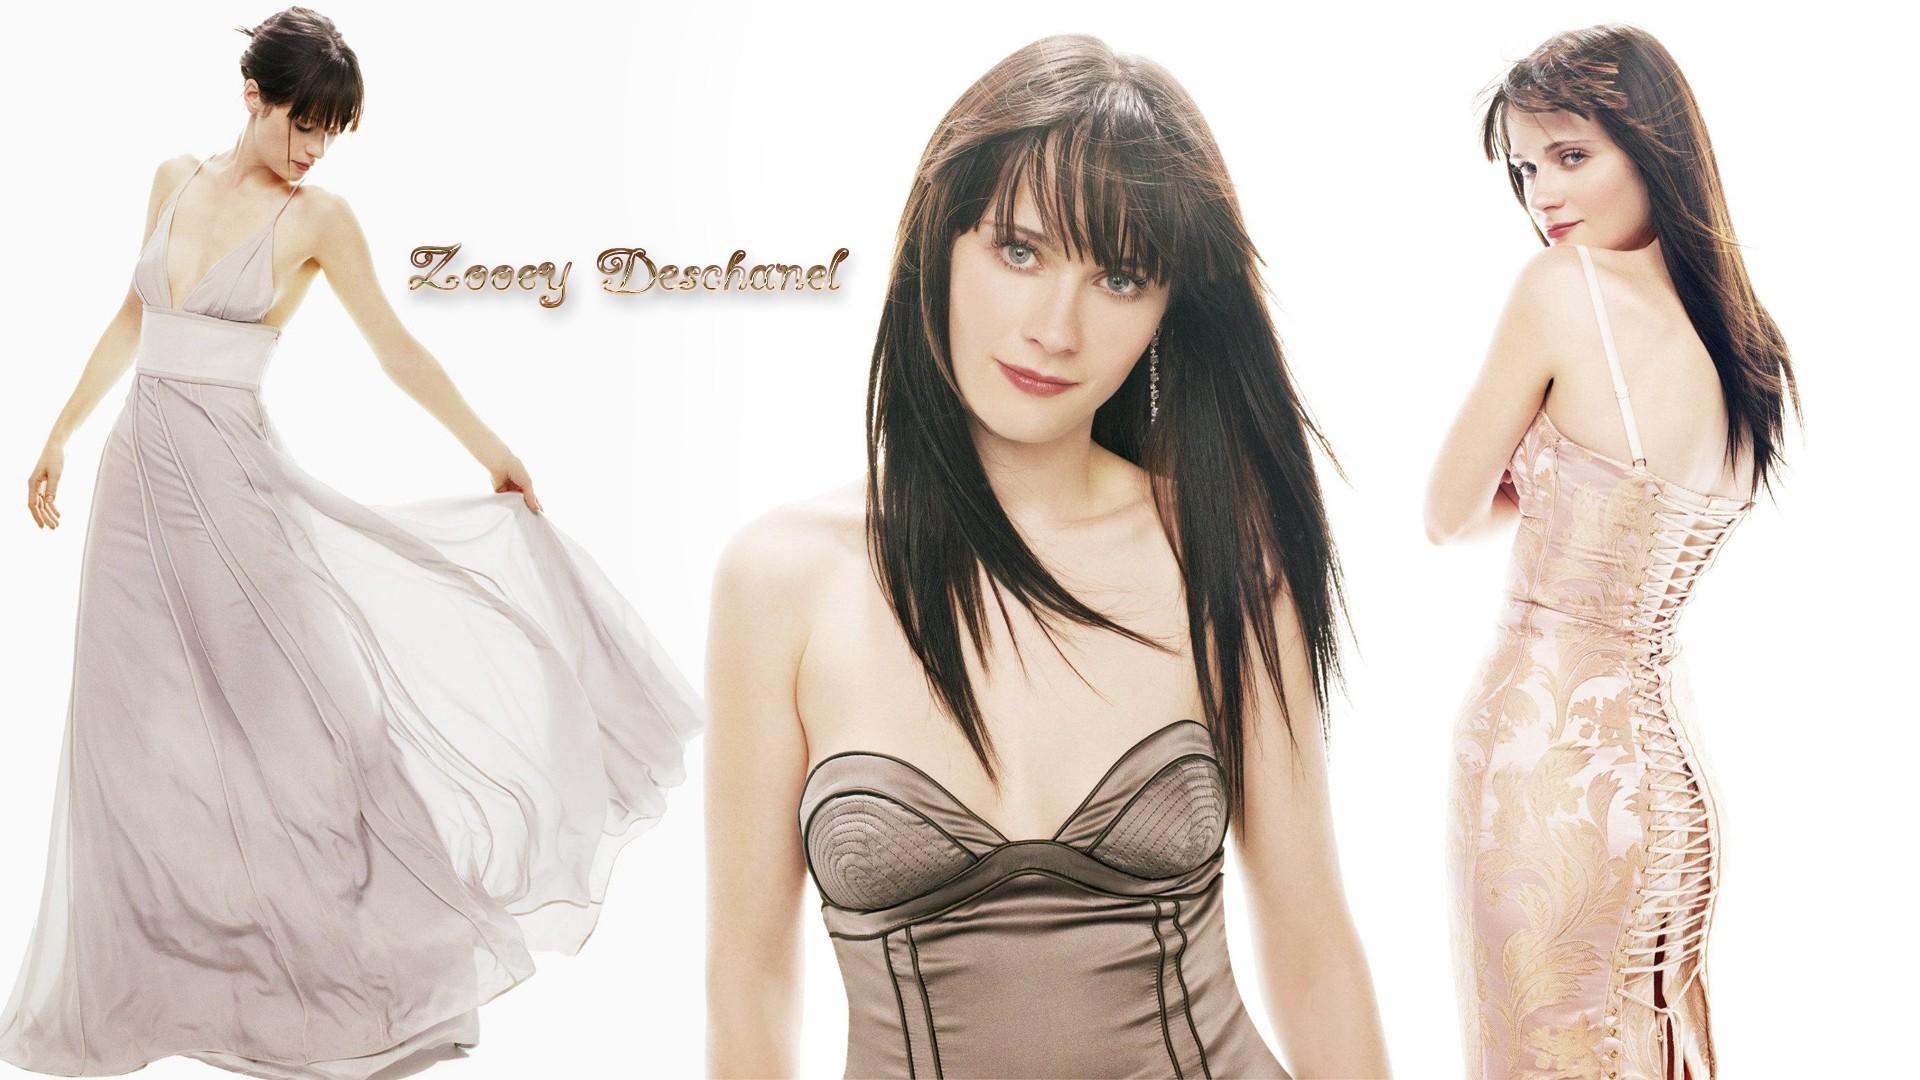 Hintergrundbilder : Frau, Modell-, Berühmtheit, Kleid, Mode ...